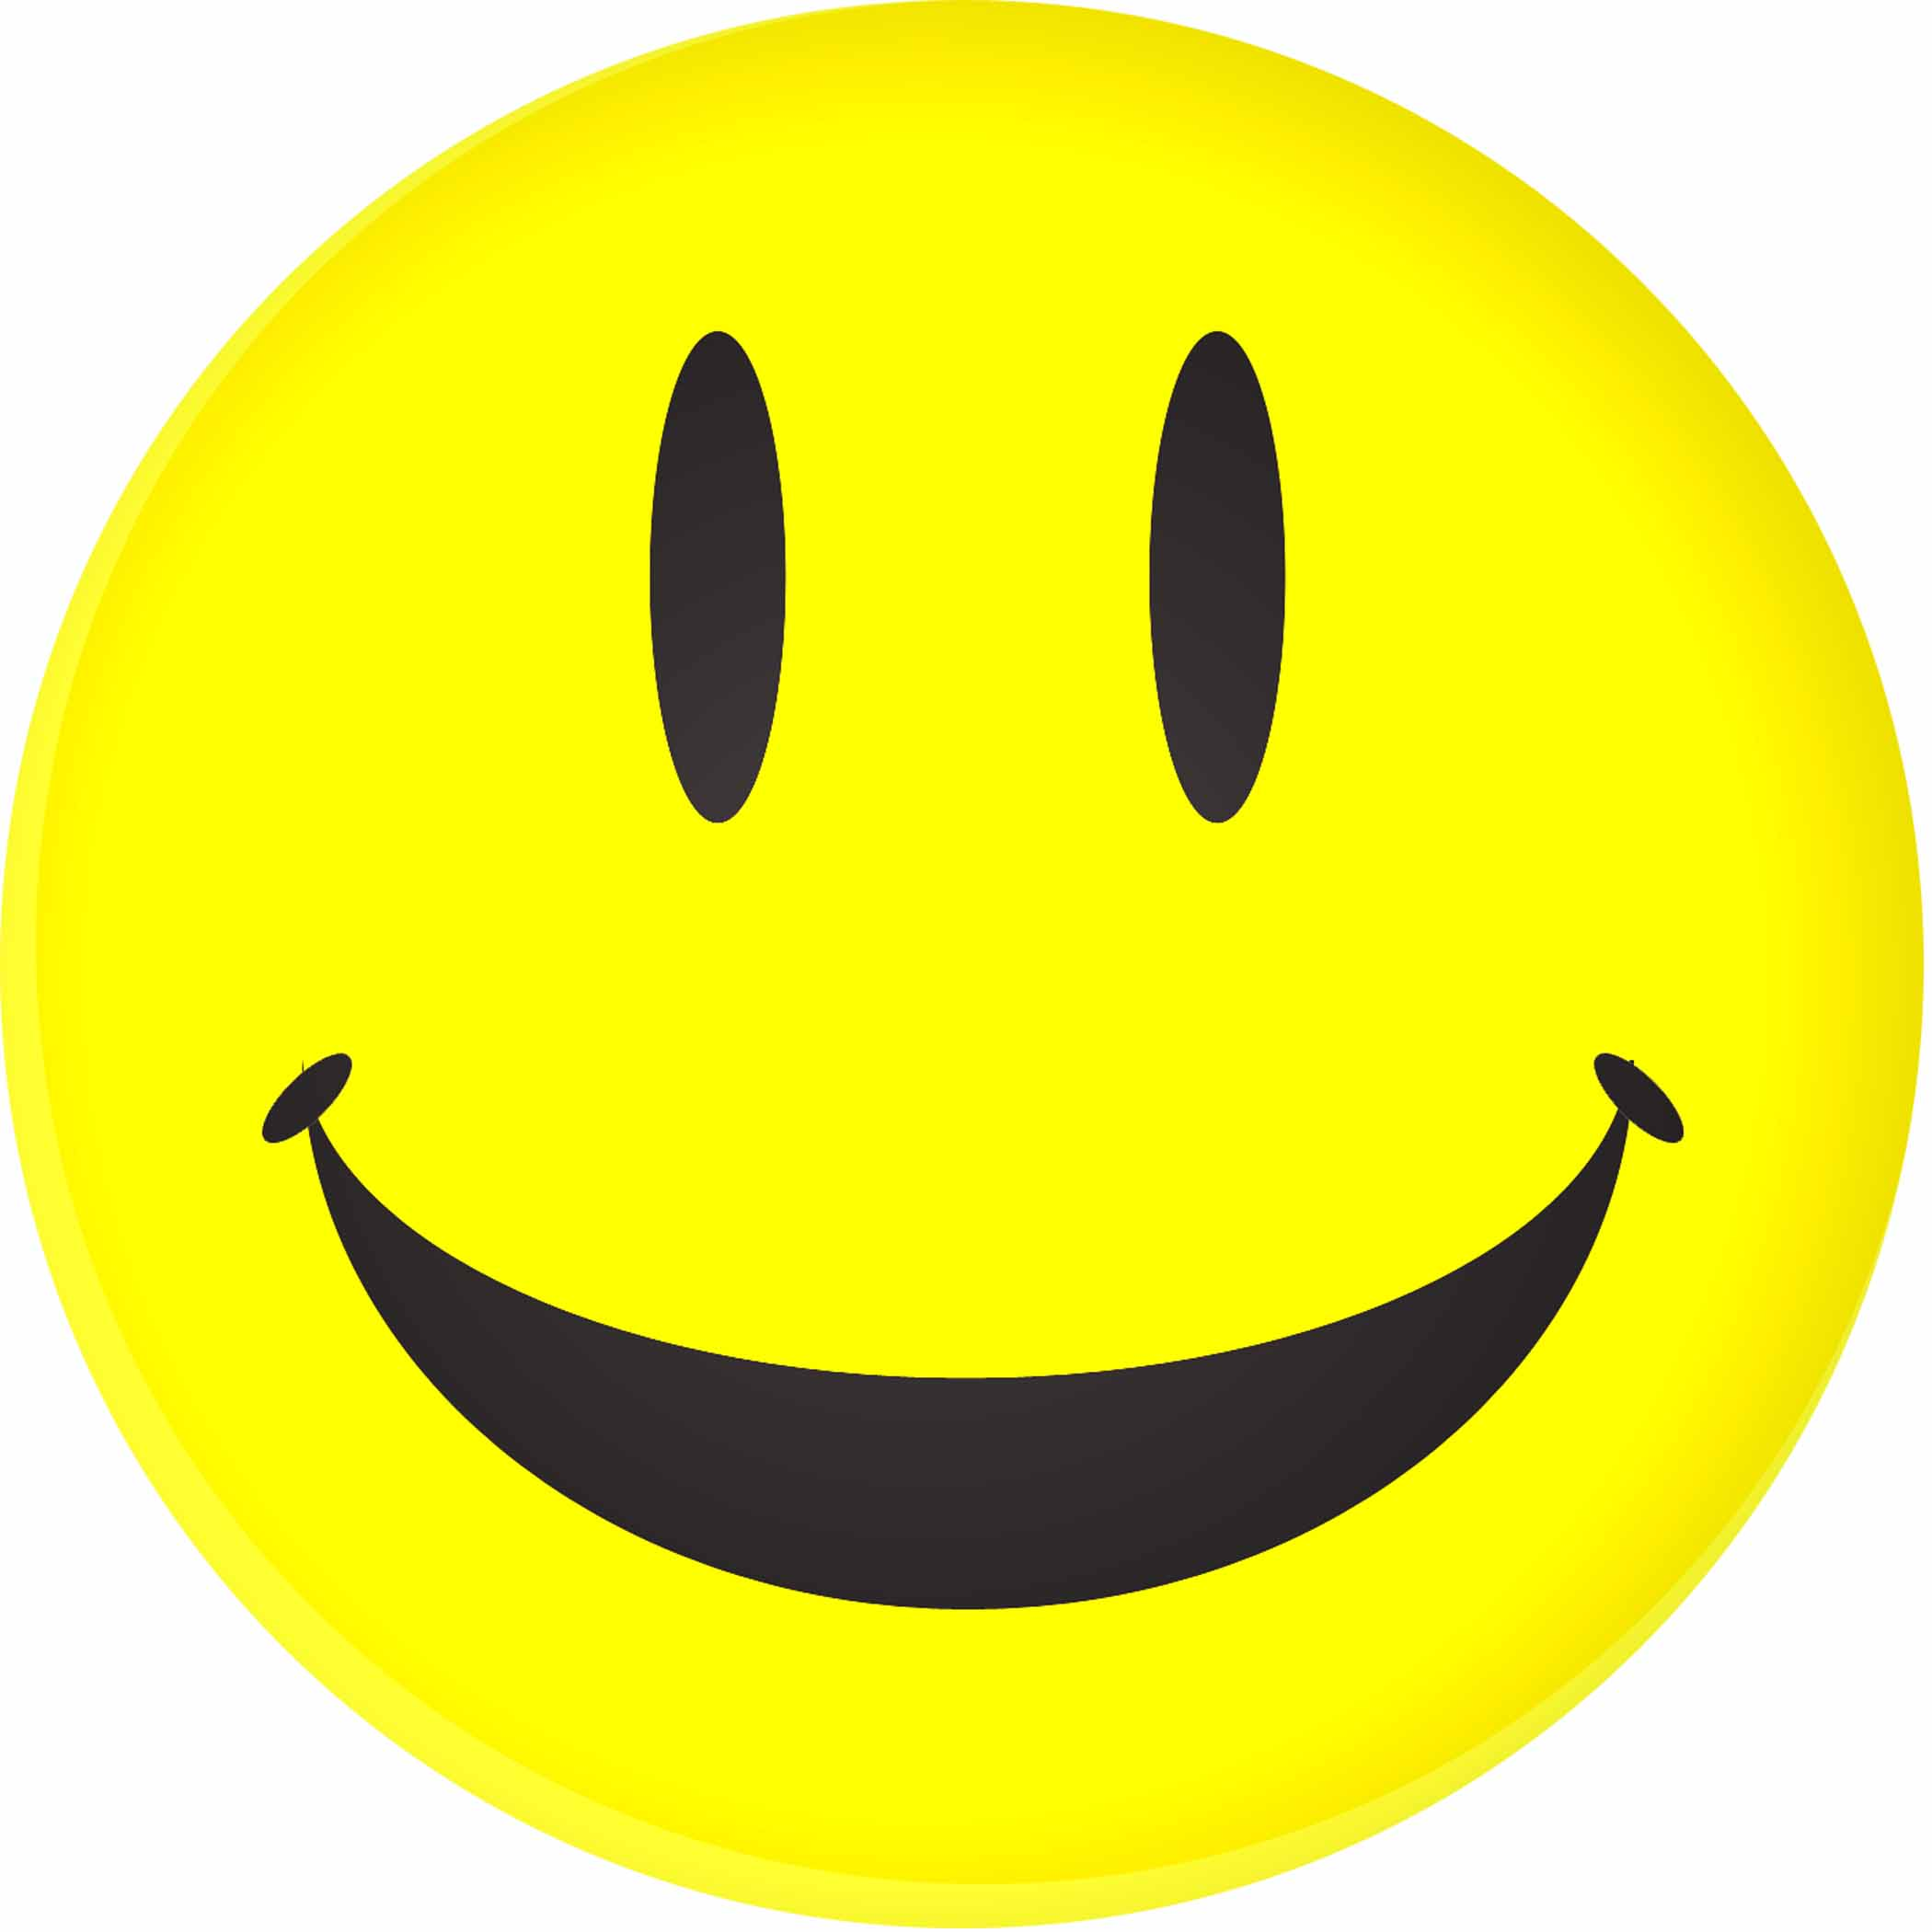 Happy Face Clip Art Smiley Face Clipart -Happy face clip art smiley face clipart clipartcow-5